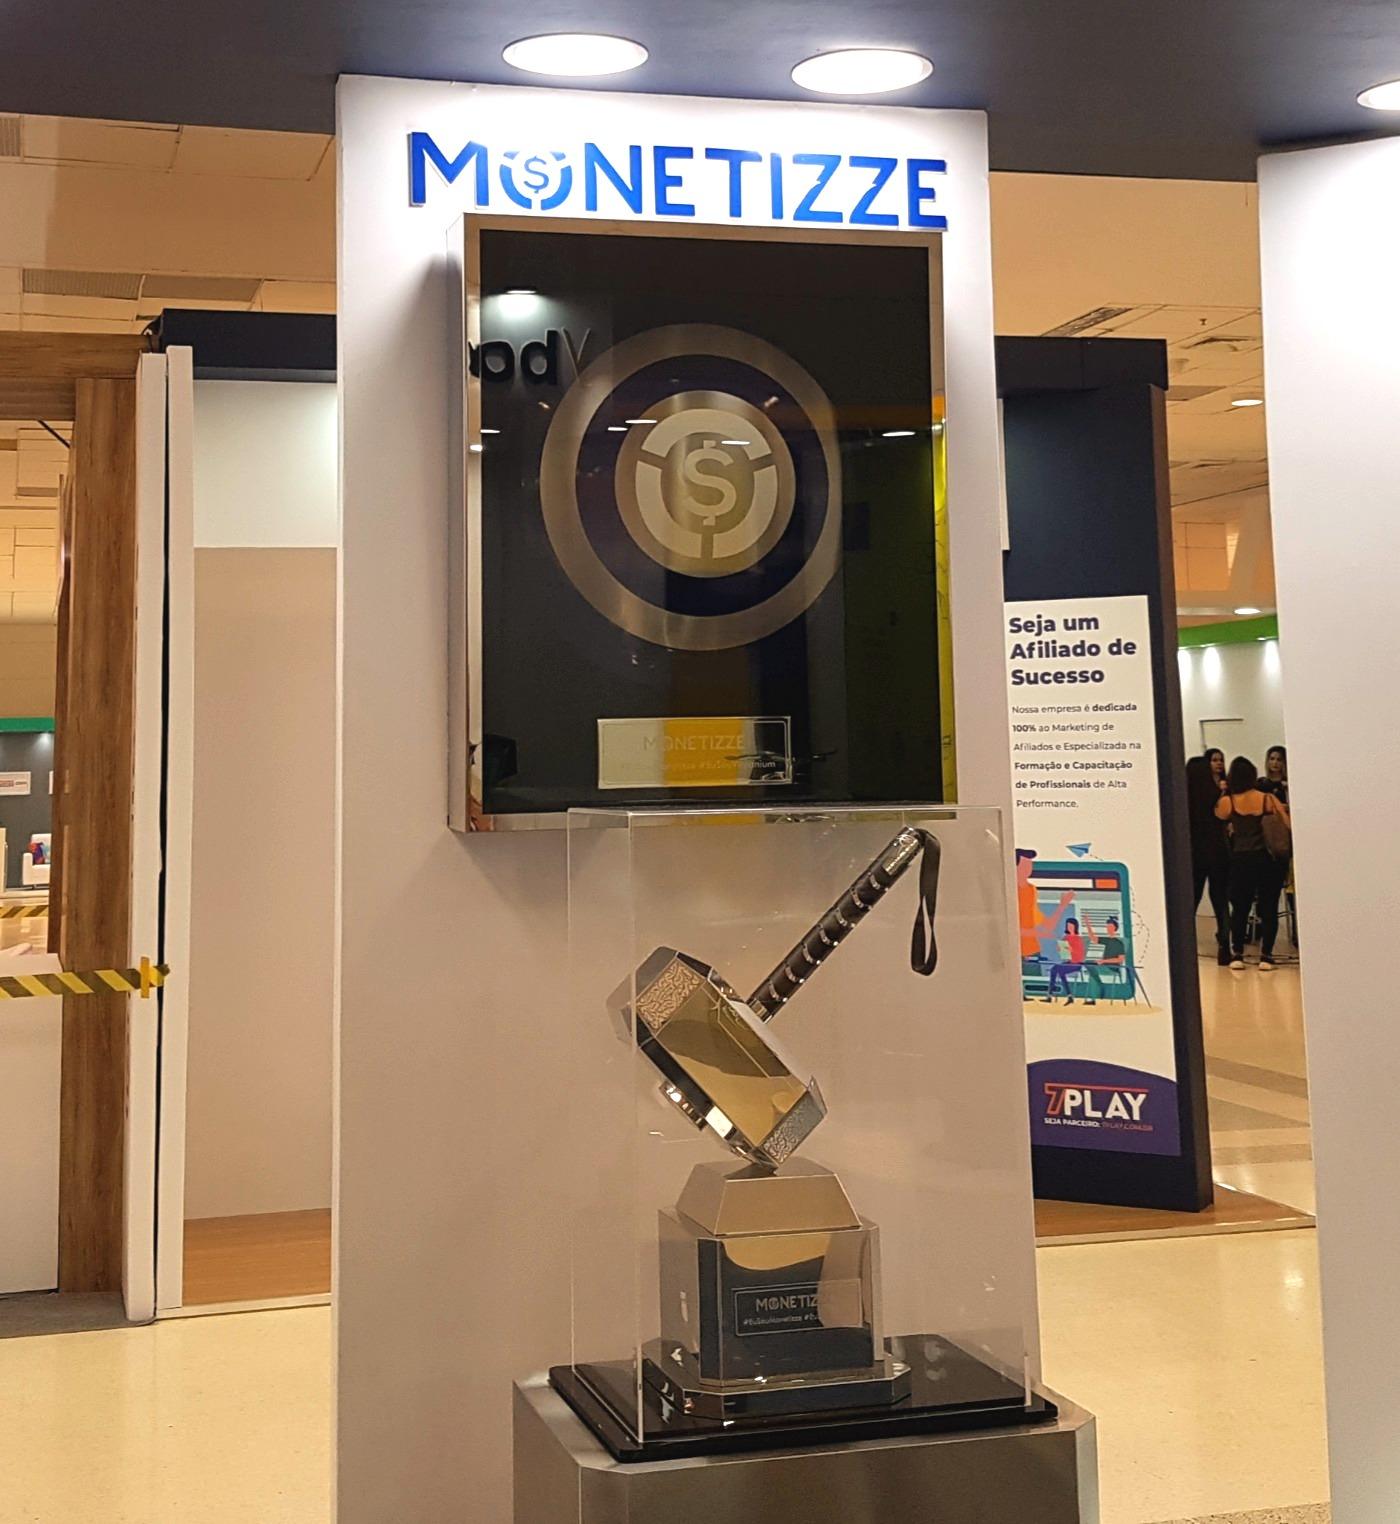 monetizze_editado_editado